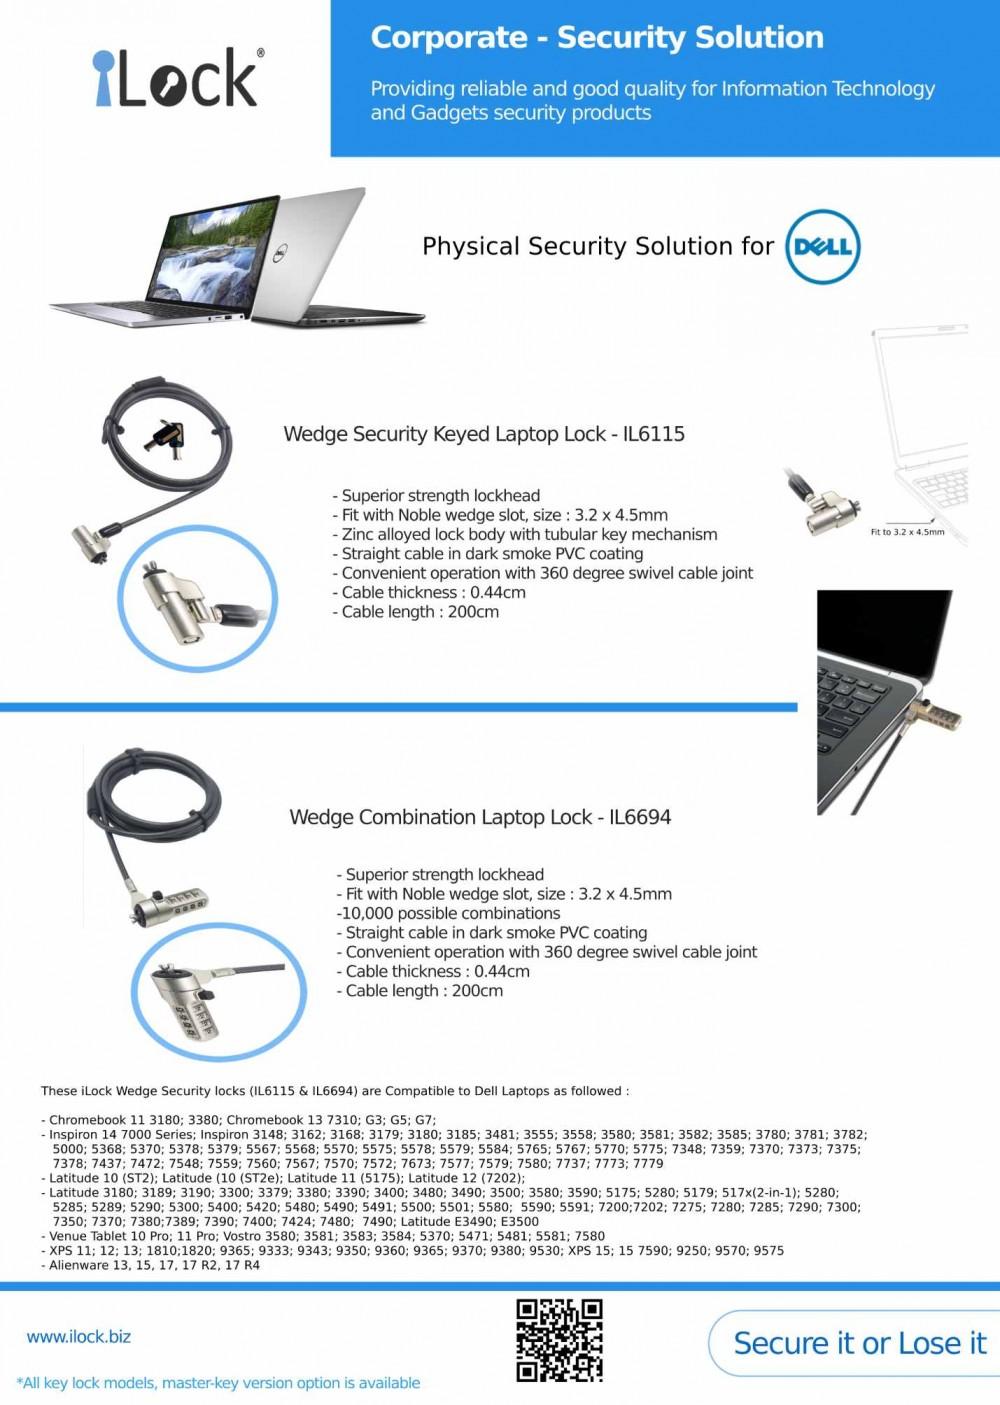 iLock Lock for Dell Laptop